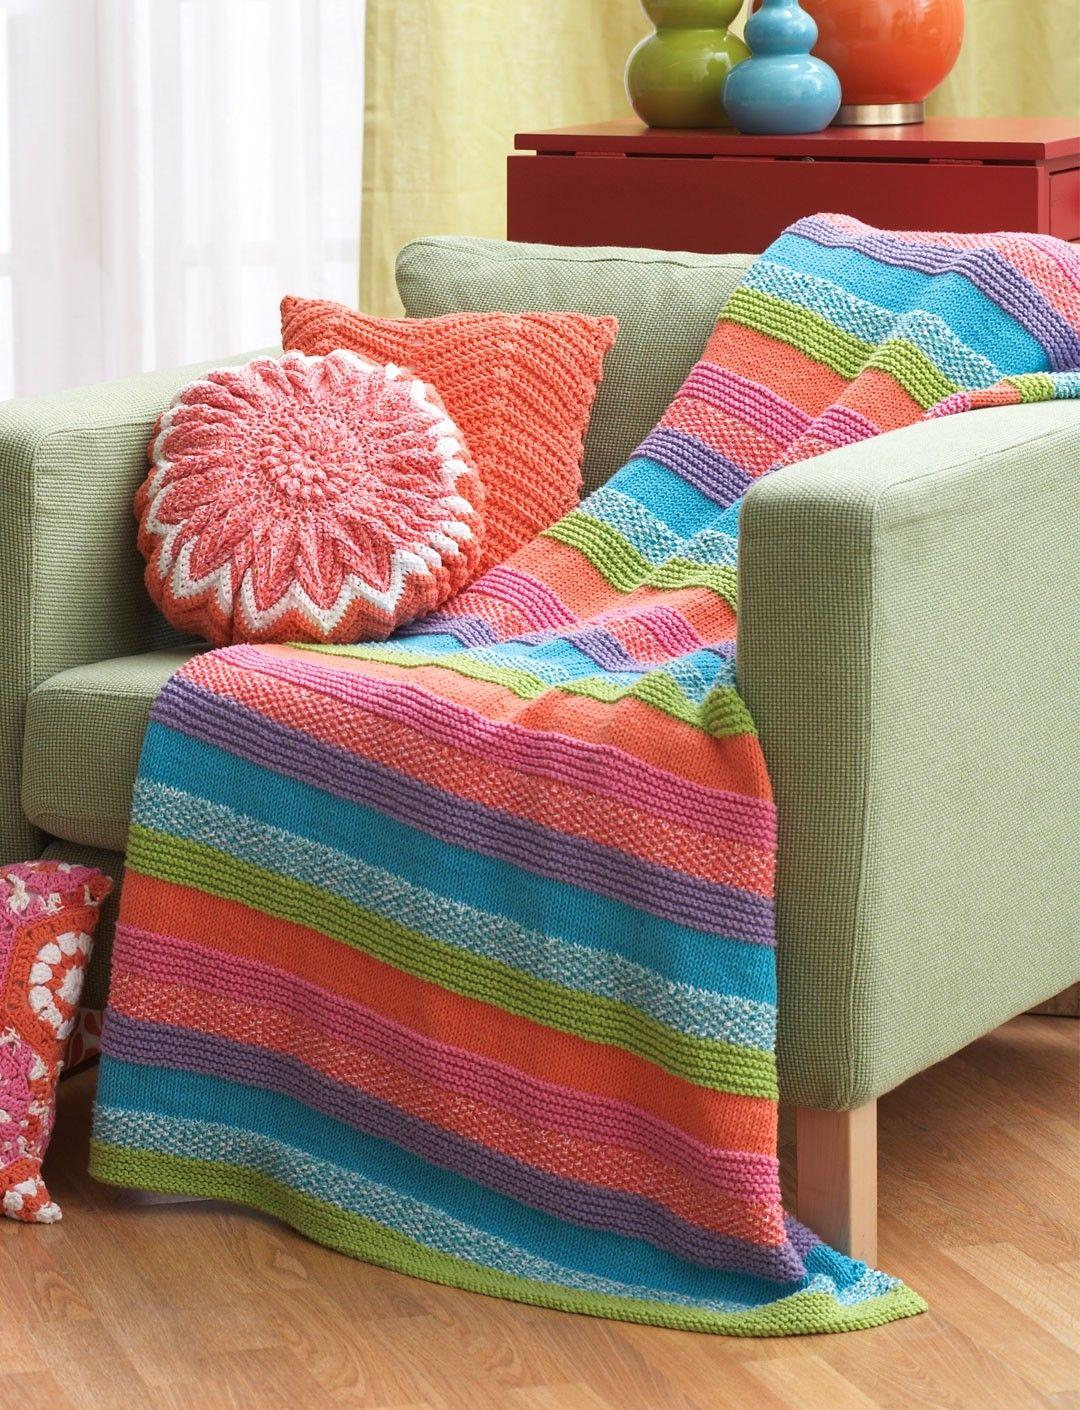 Yarnspirations.com - Bernat Striped Blanket -Free Pattern - Easy ...